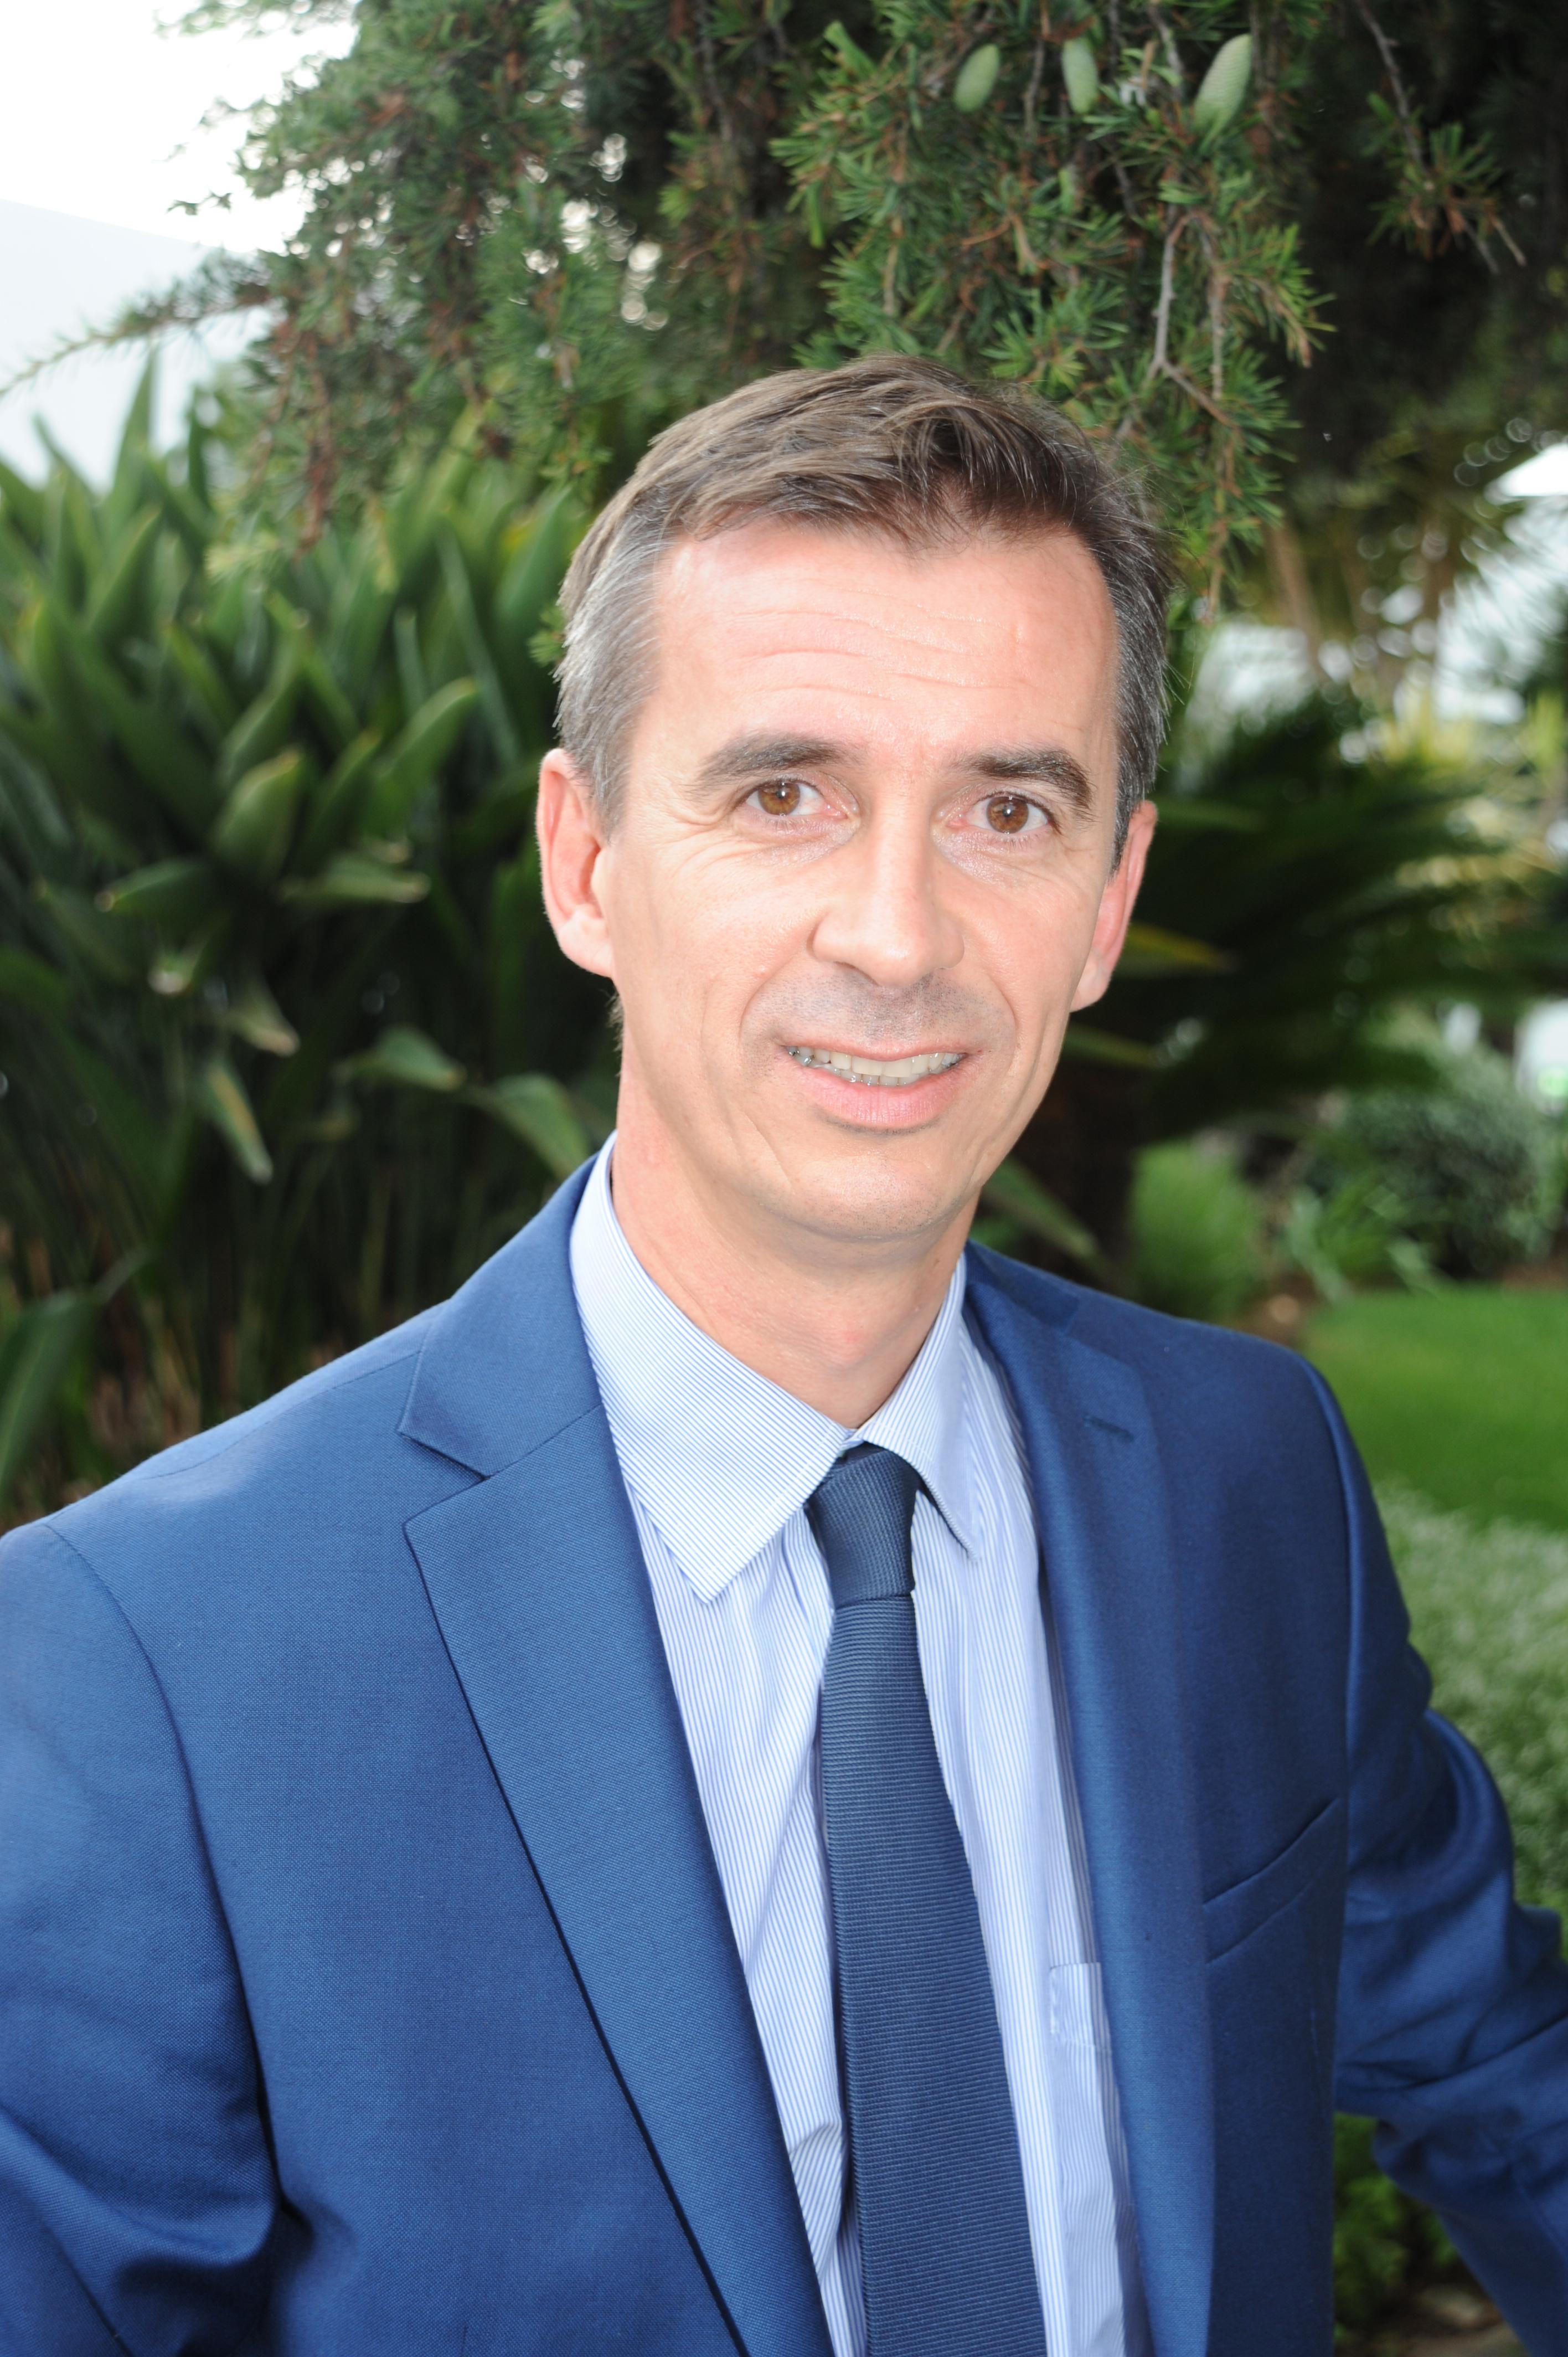 Dufry's Antonin Carreau